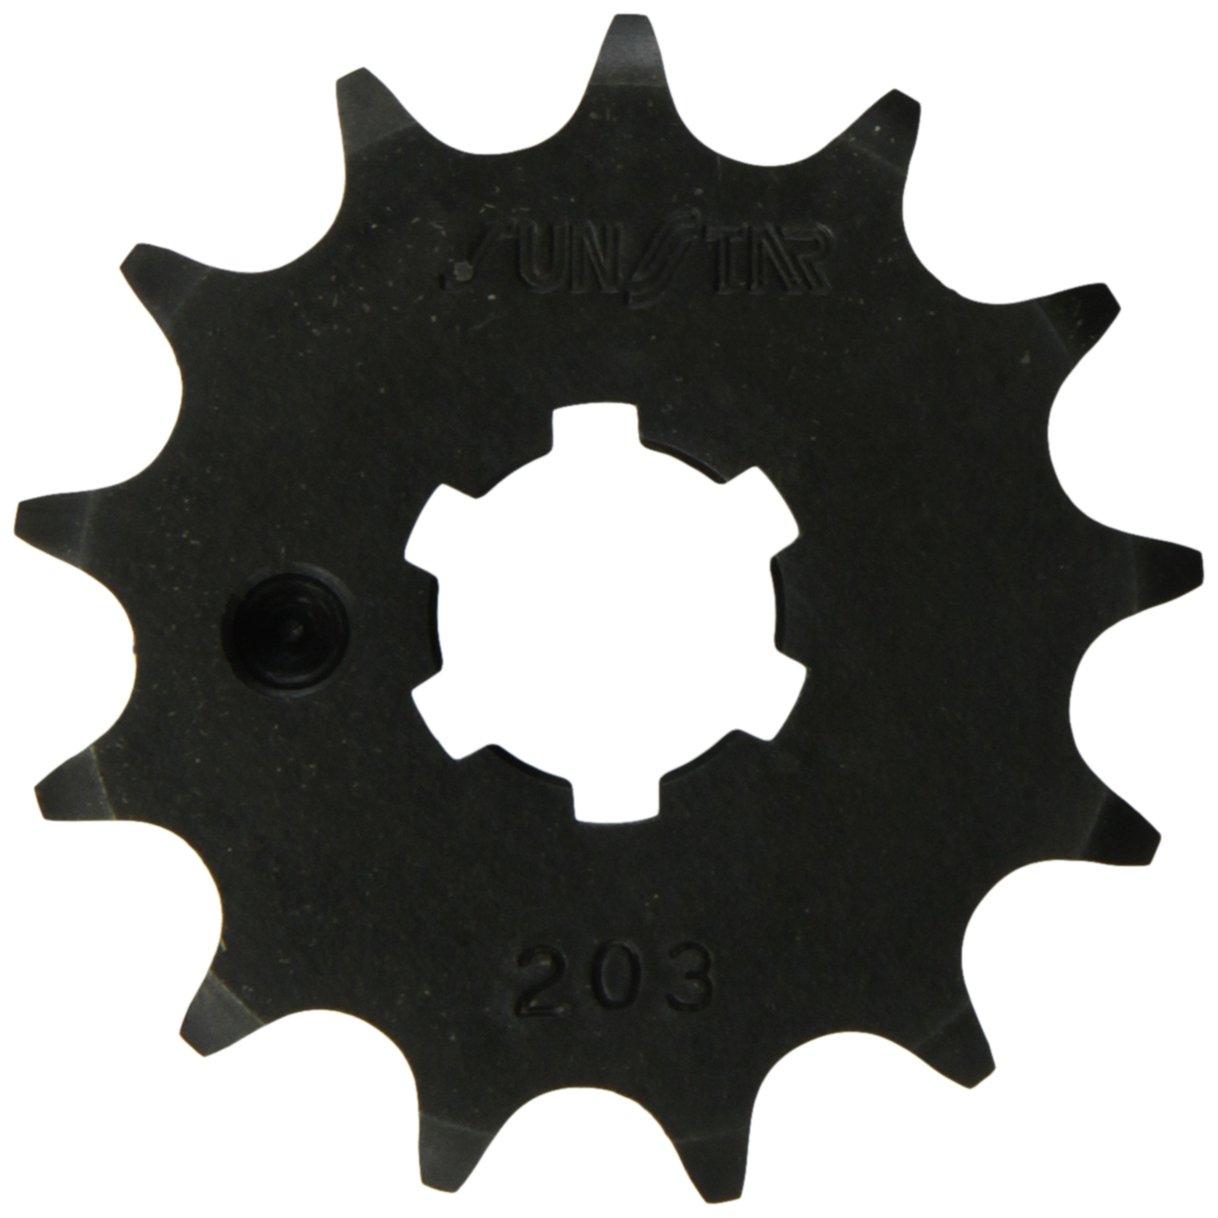 Sunstar 20313 13-Teeth 428 Chain Size Front Countershaft Sprocket